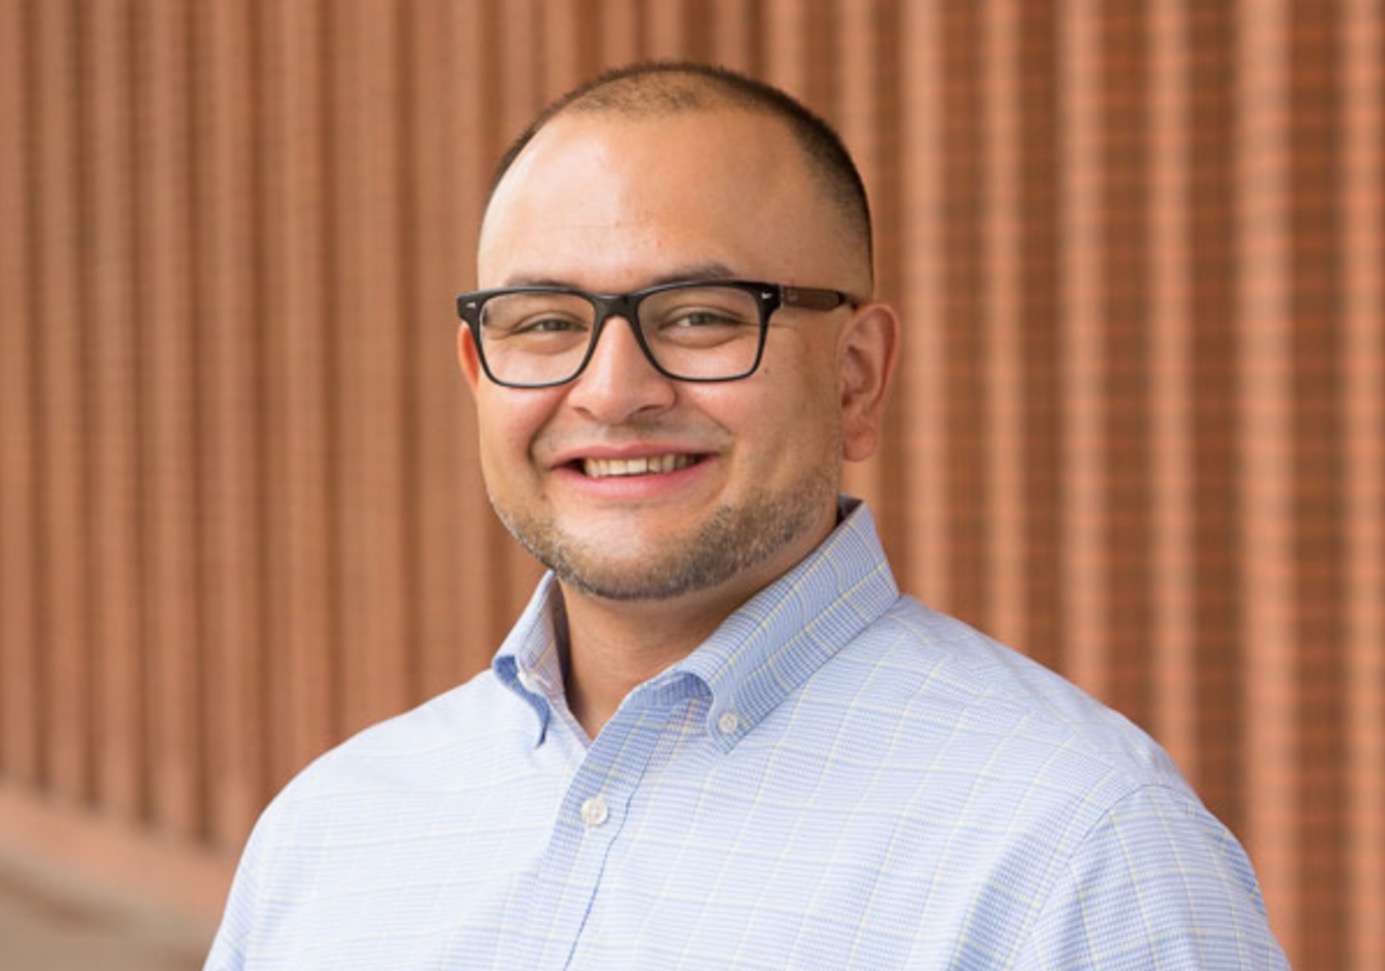 Adrian H. Huerta, Ph.D.